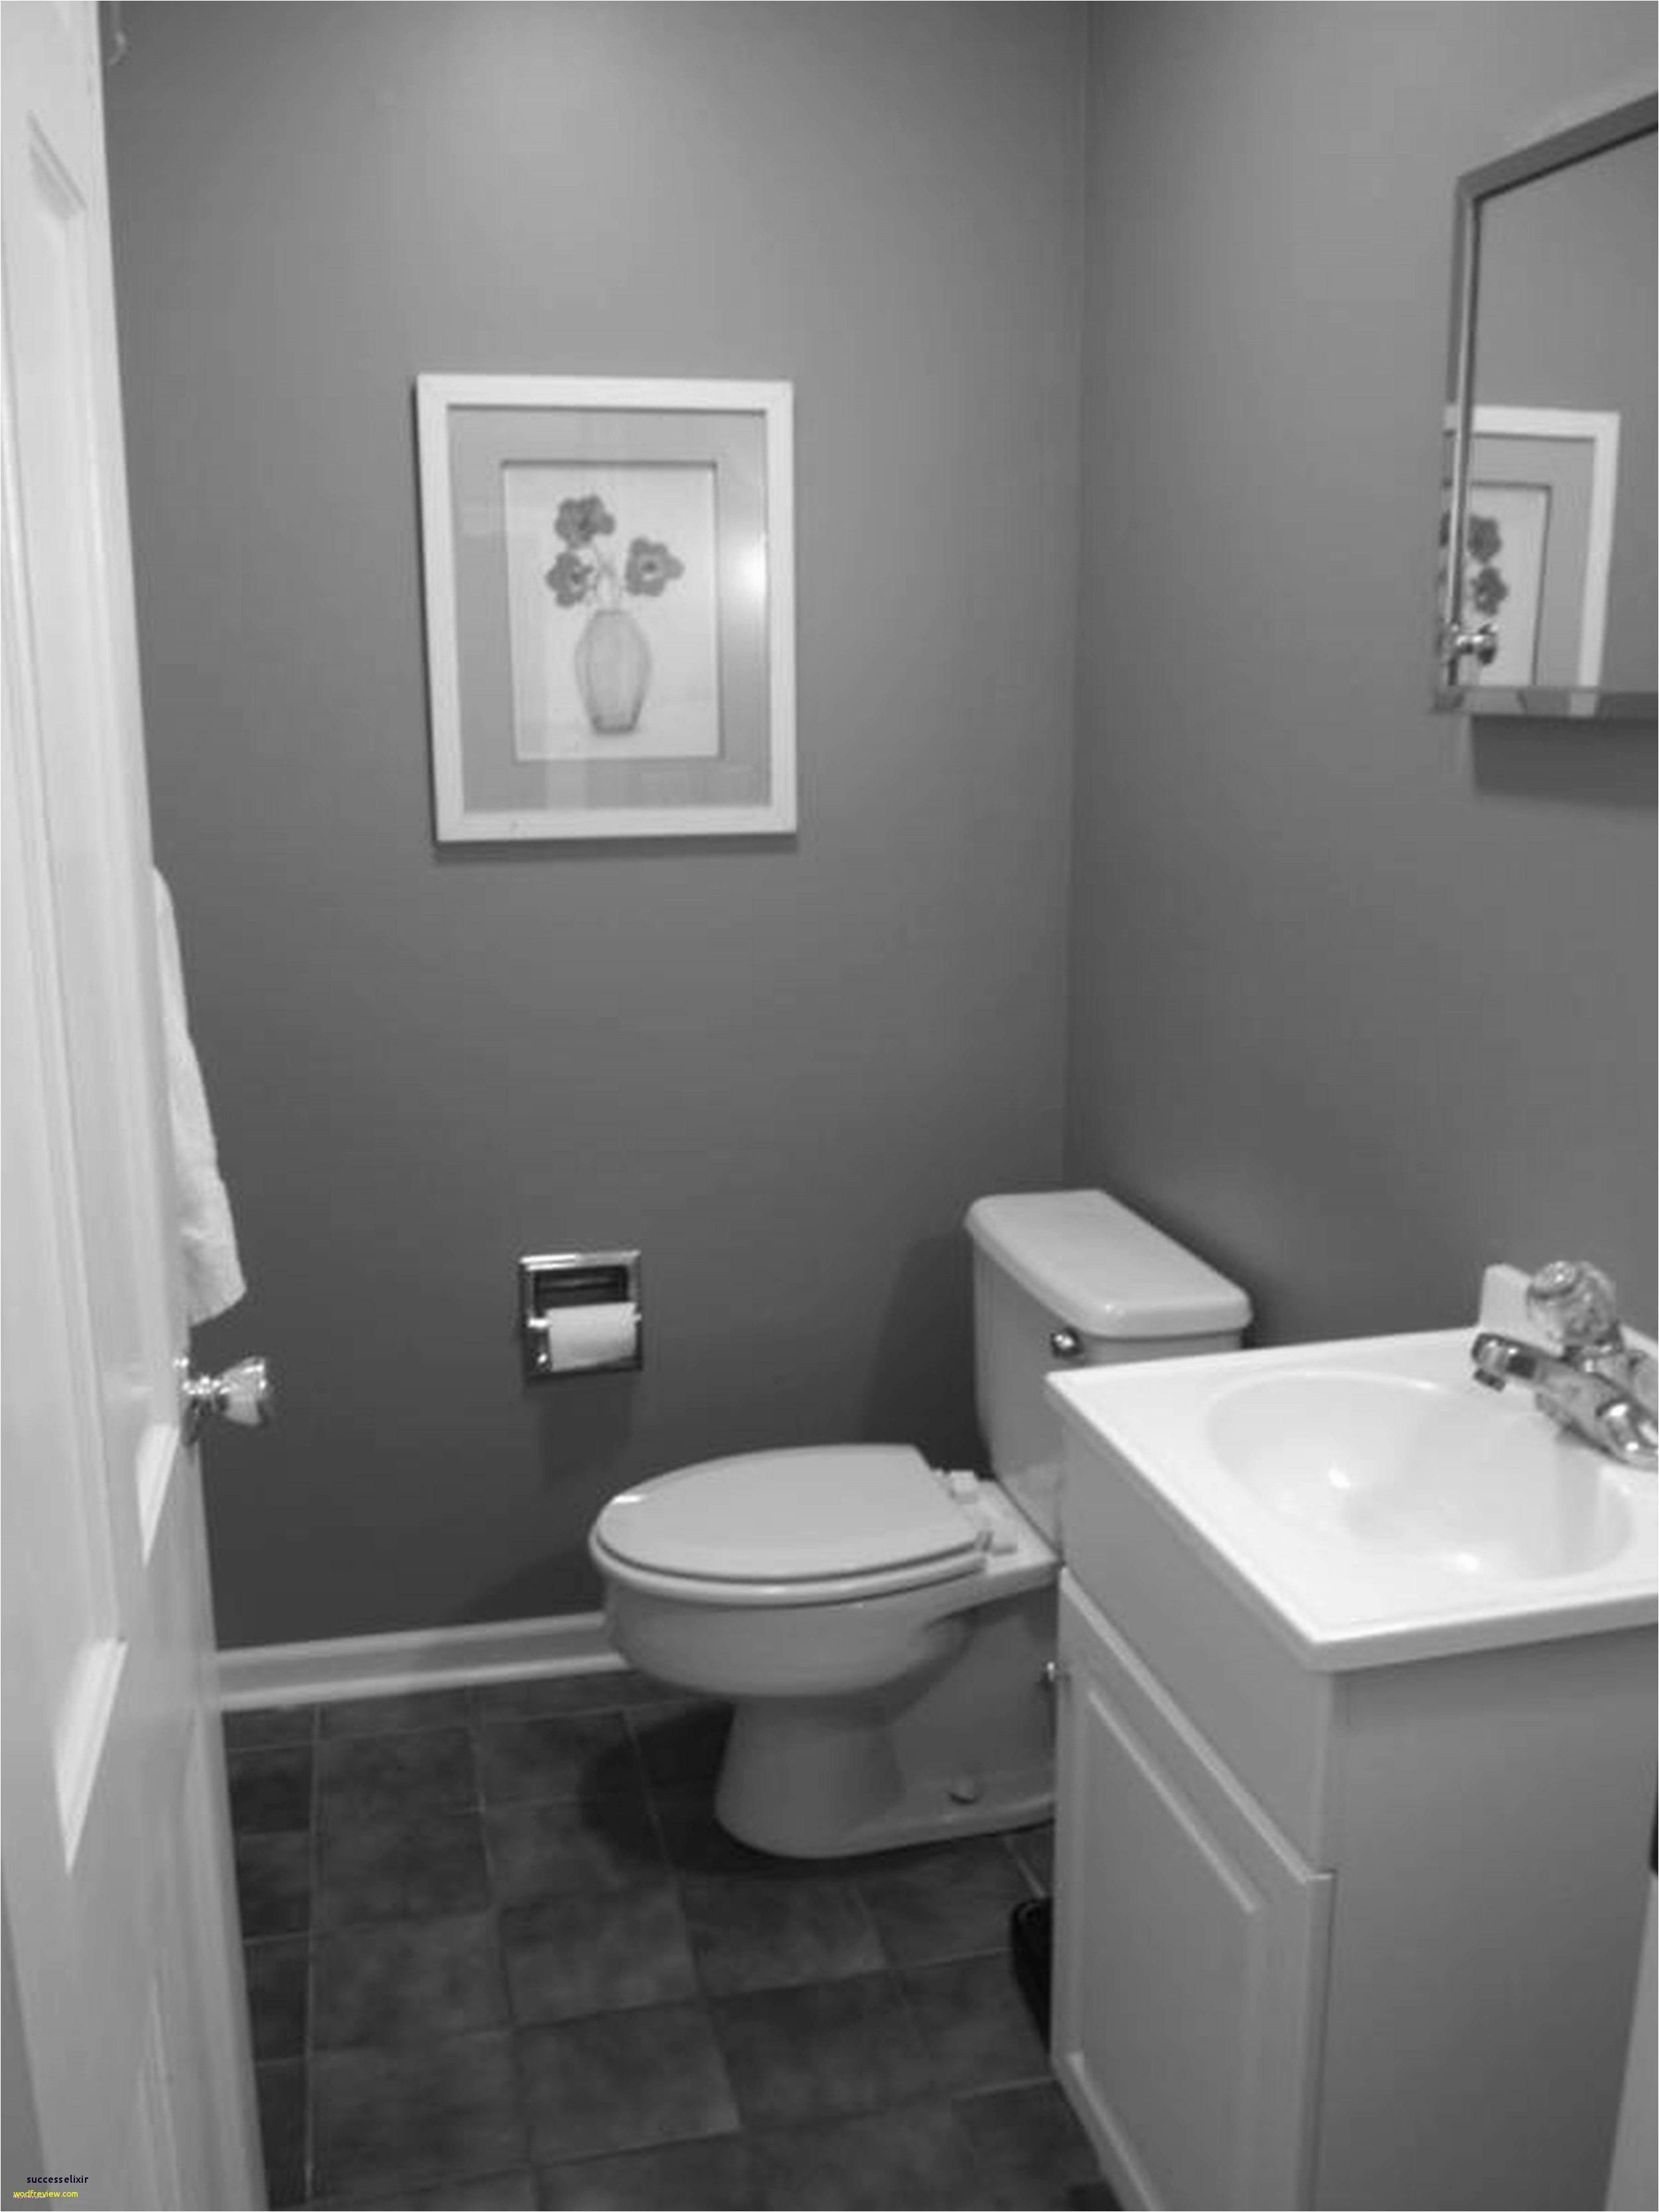 Bathroom Design Ideas Nz Inspirational top Bathroom Colors